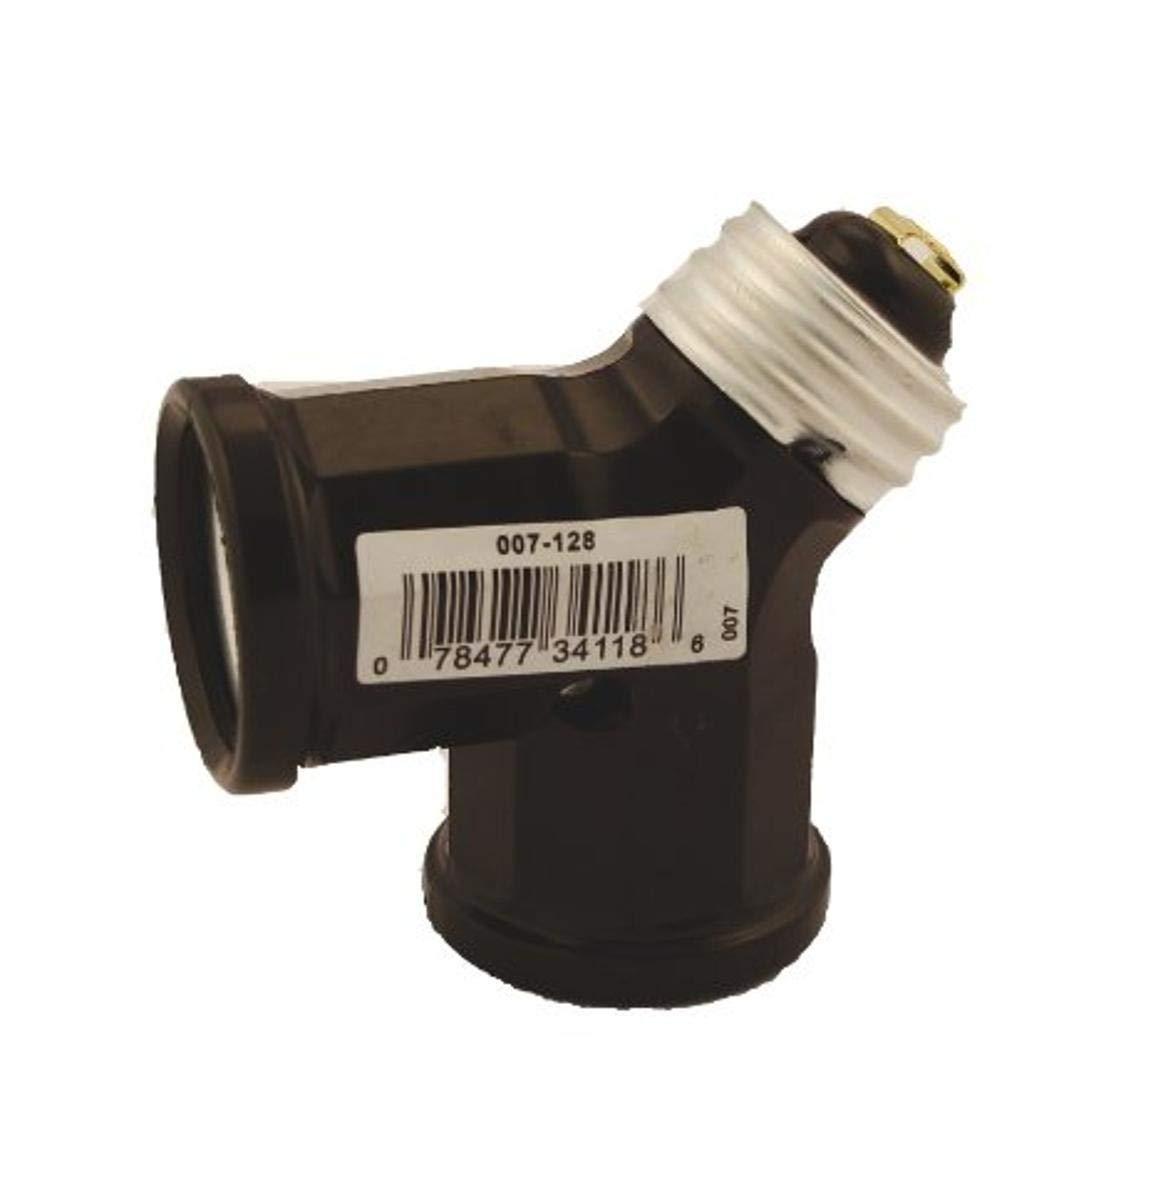 Leviton 128 15 Amp, 660 Watt, 250 Volt, Twin Light Socket Adapter, Brown